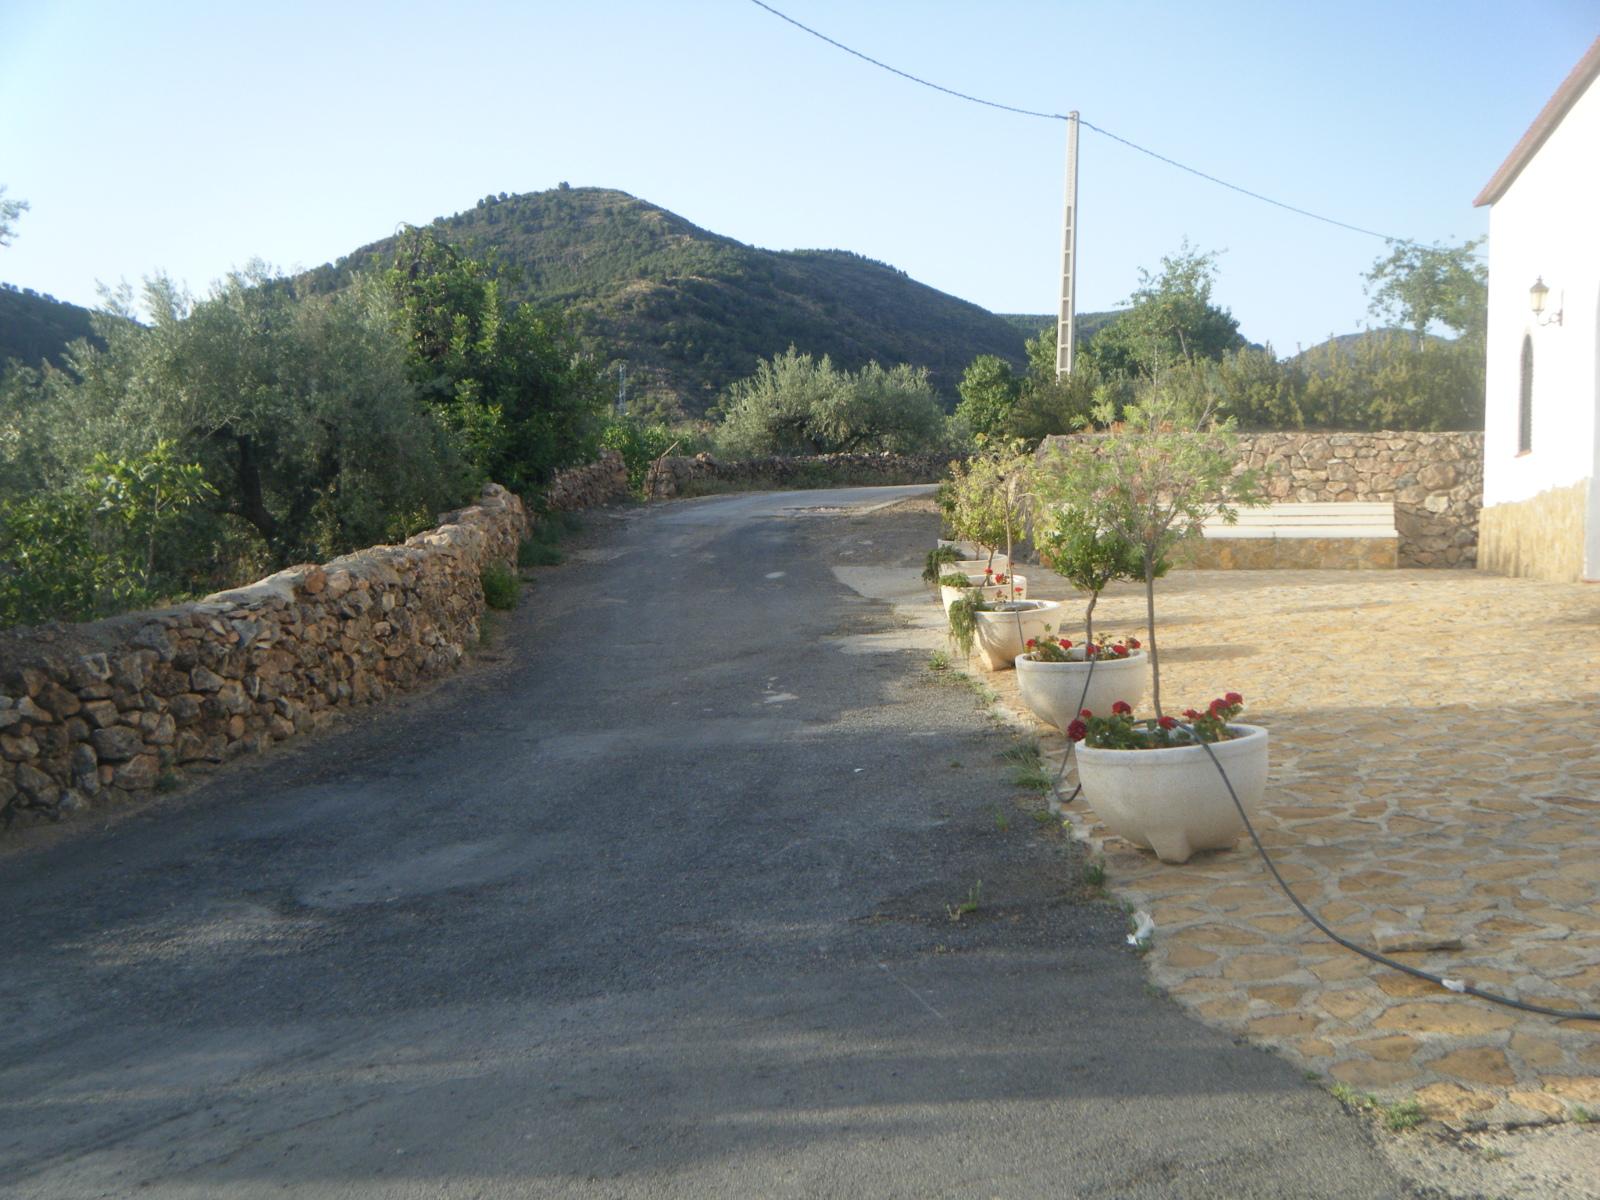 ¿ Mina Ora pró novis? Cerro Quintana, Canjáyar, Almeria, Andalucia, España X2nt4j